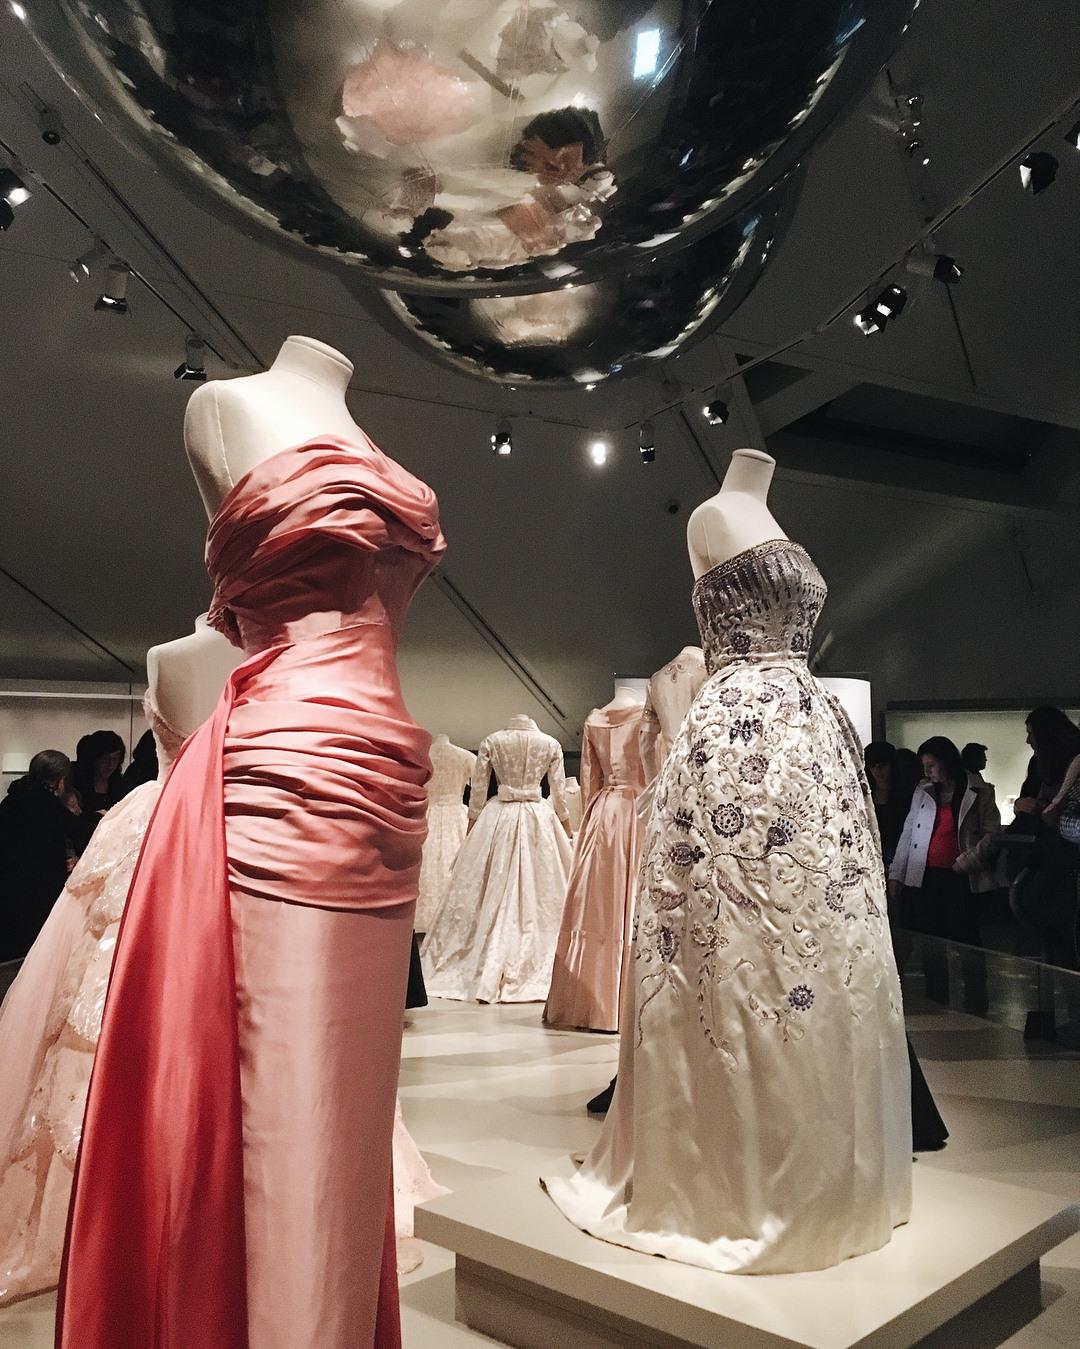 dior dresses2.jpg